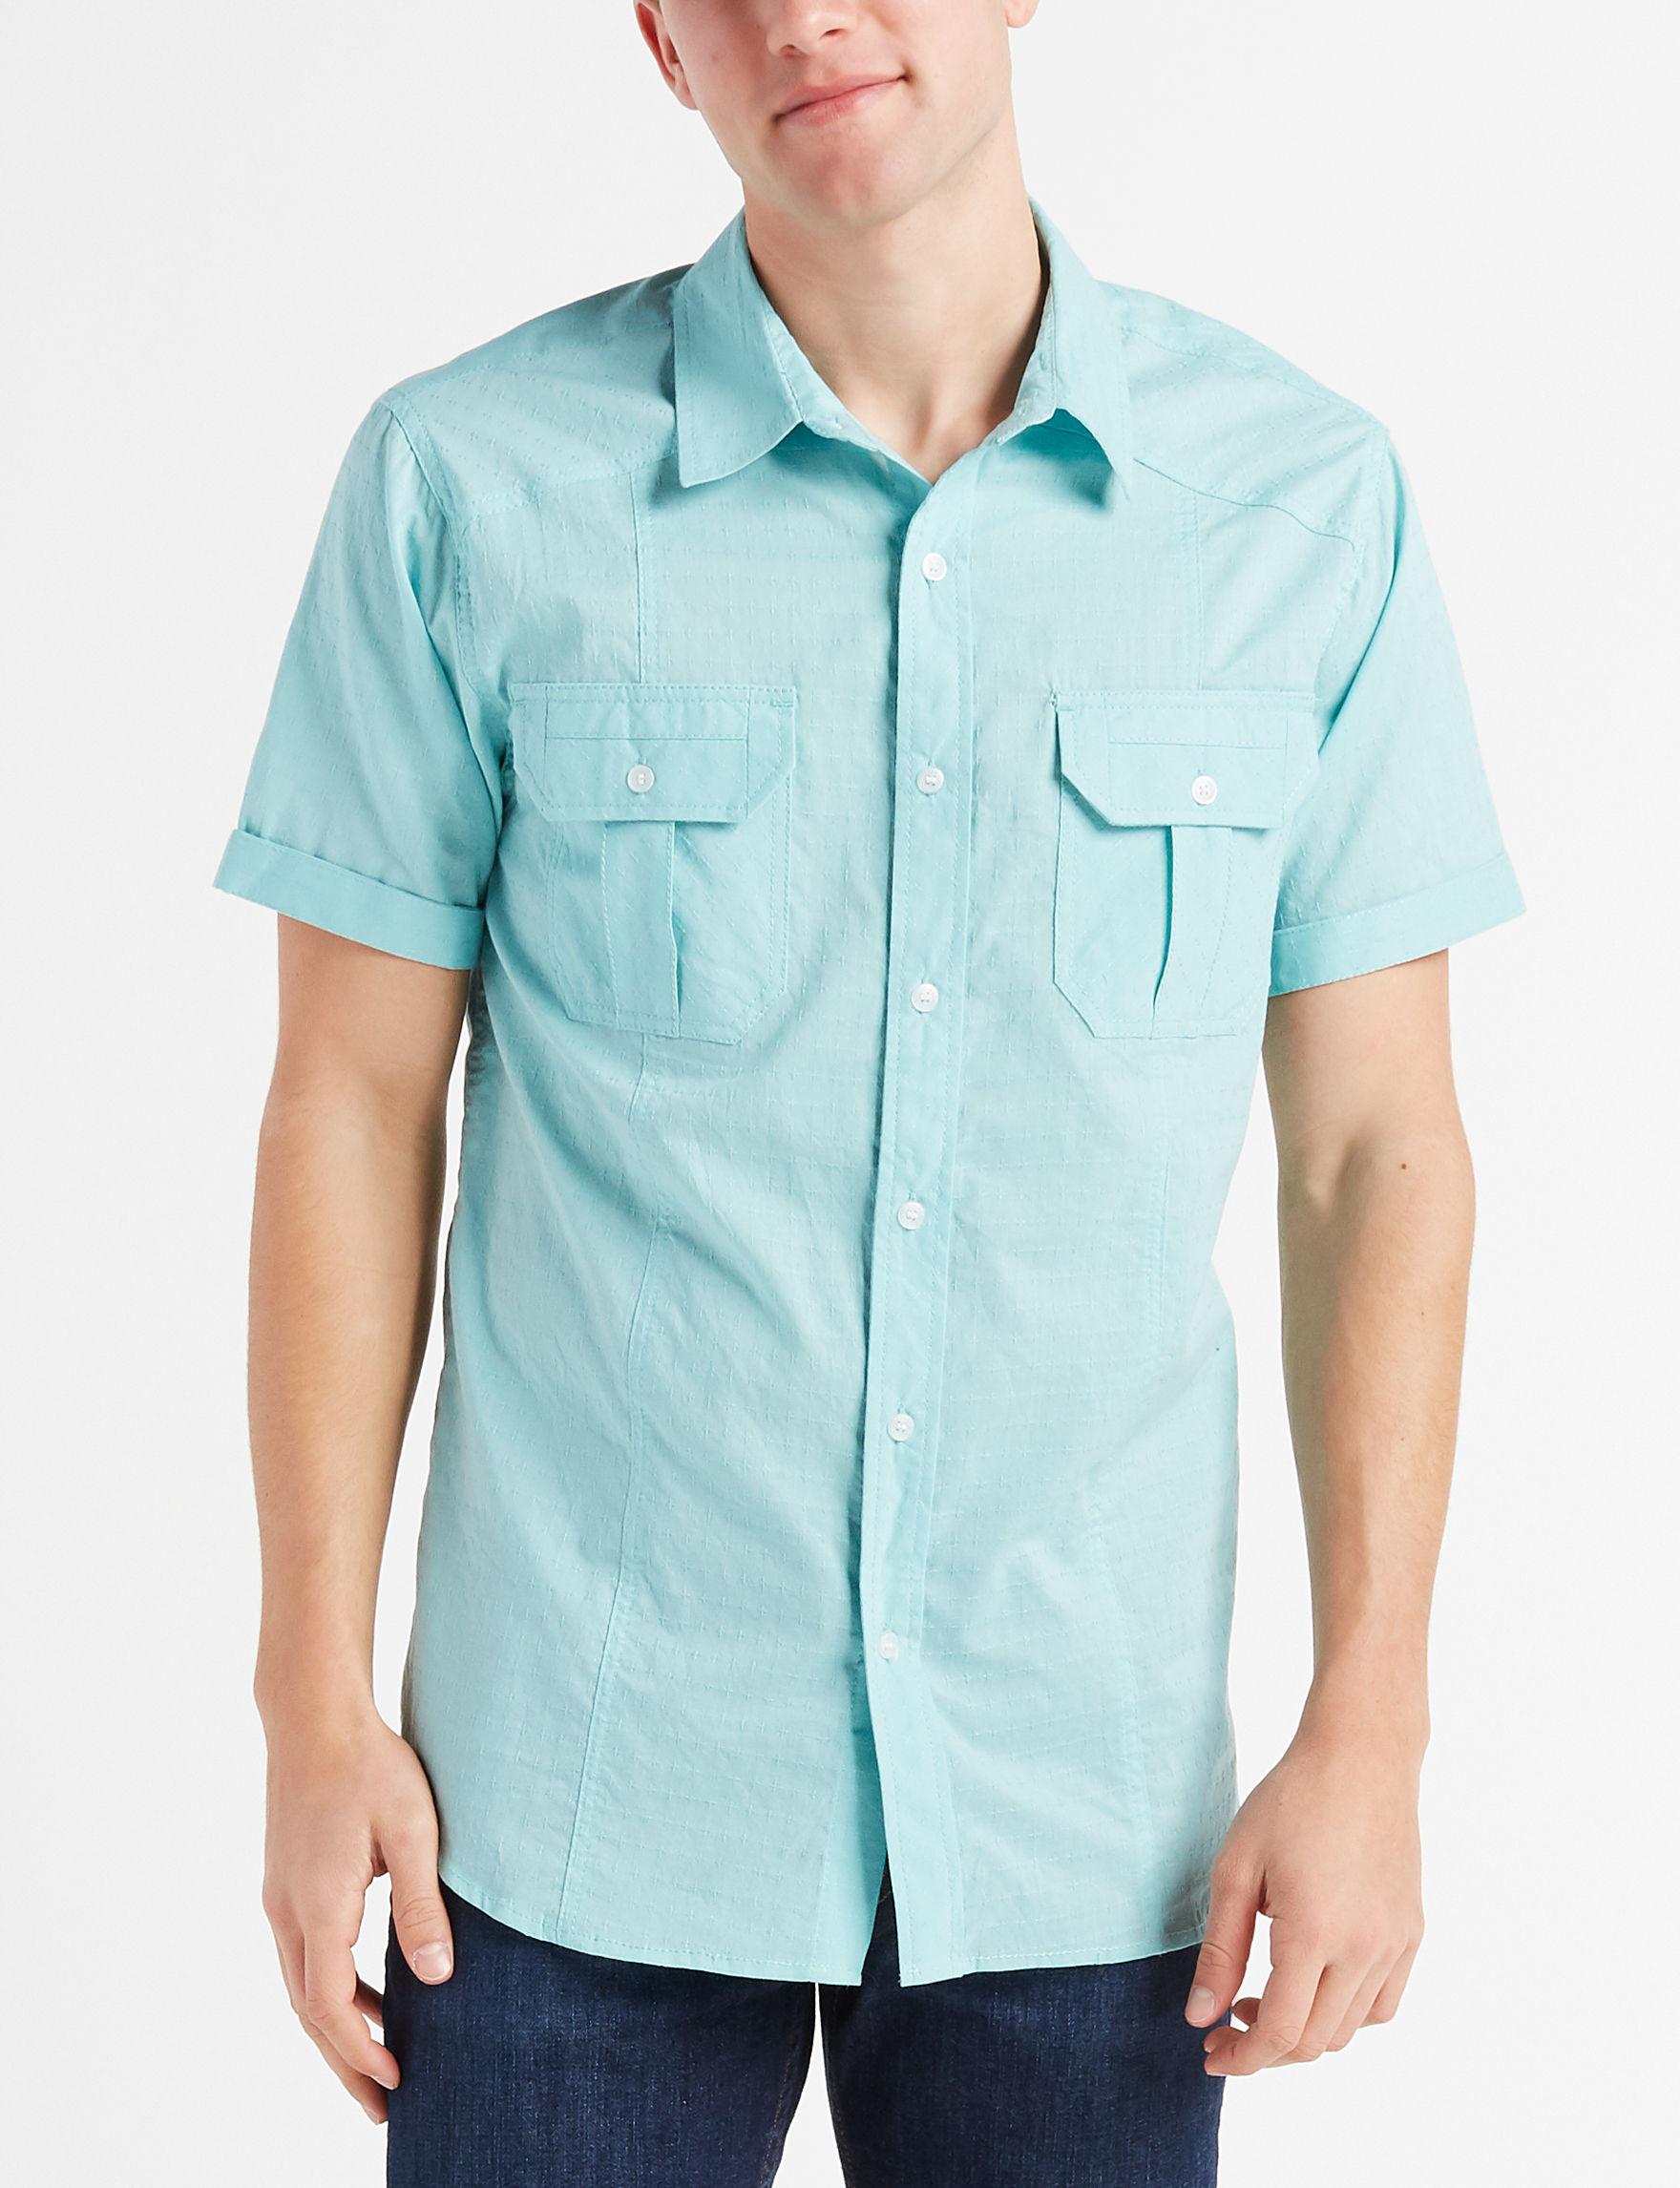 Surplus Light Grey Casual Button Down Shirts